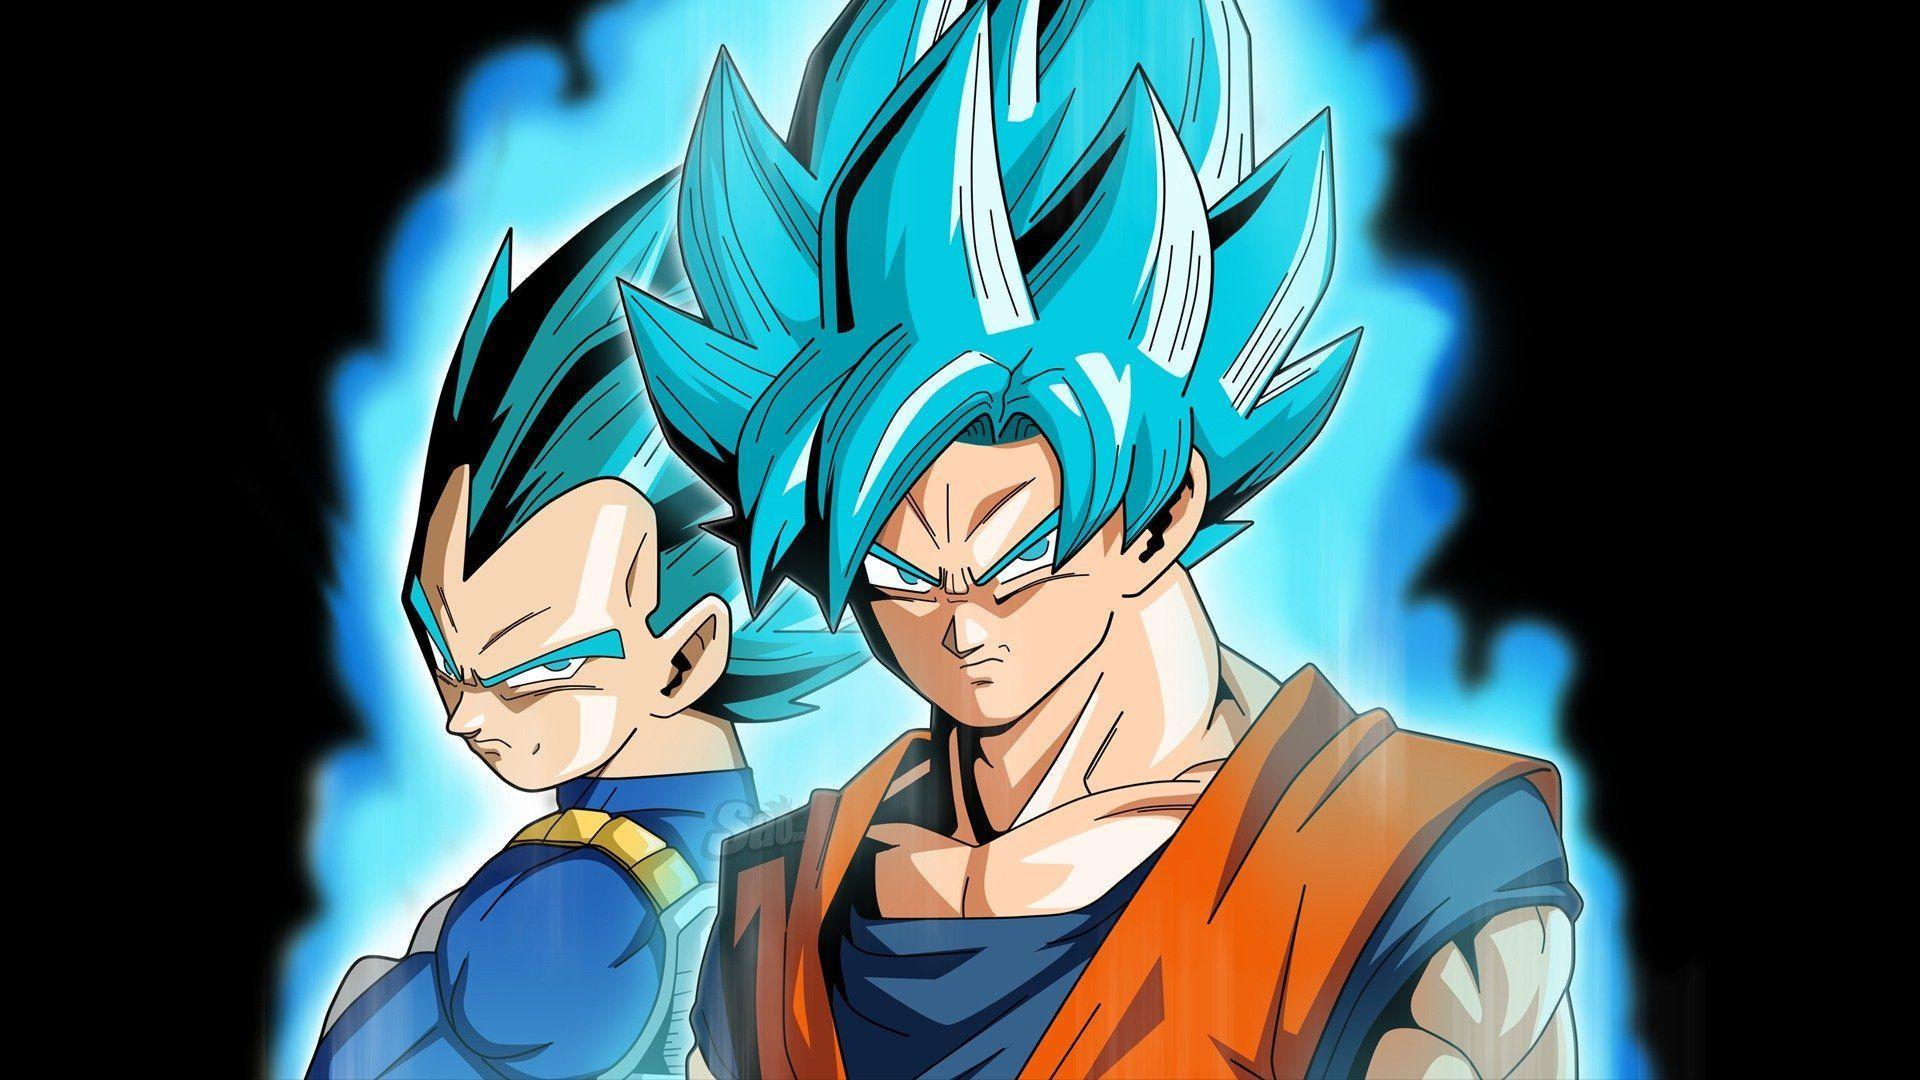 Goku and Vegeta Wallpapers - Top Free